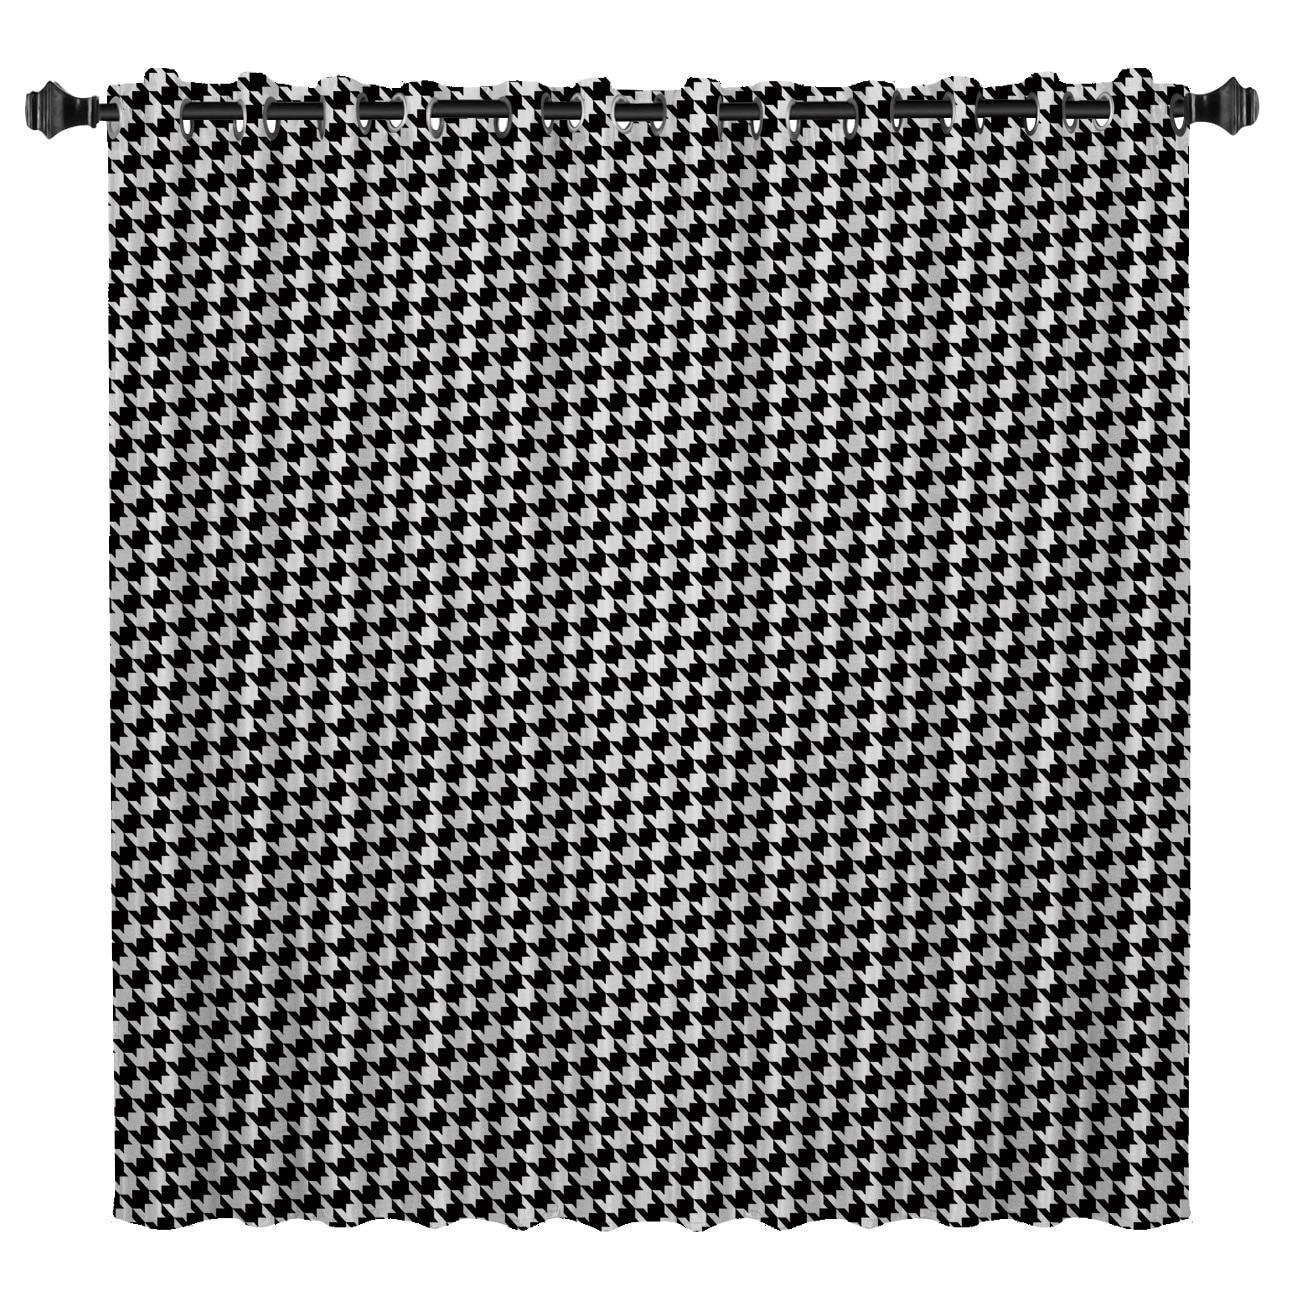 Classic Plaid Window Curtains Dark Window Blinds Bathroom Blackout Curtains Bedroom Fabric Indoor Decor Curtain Panels